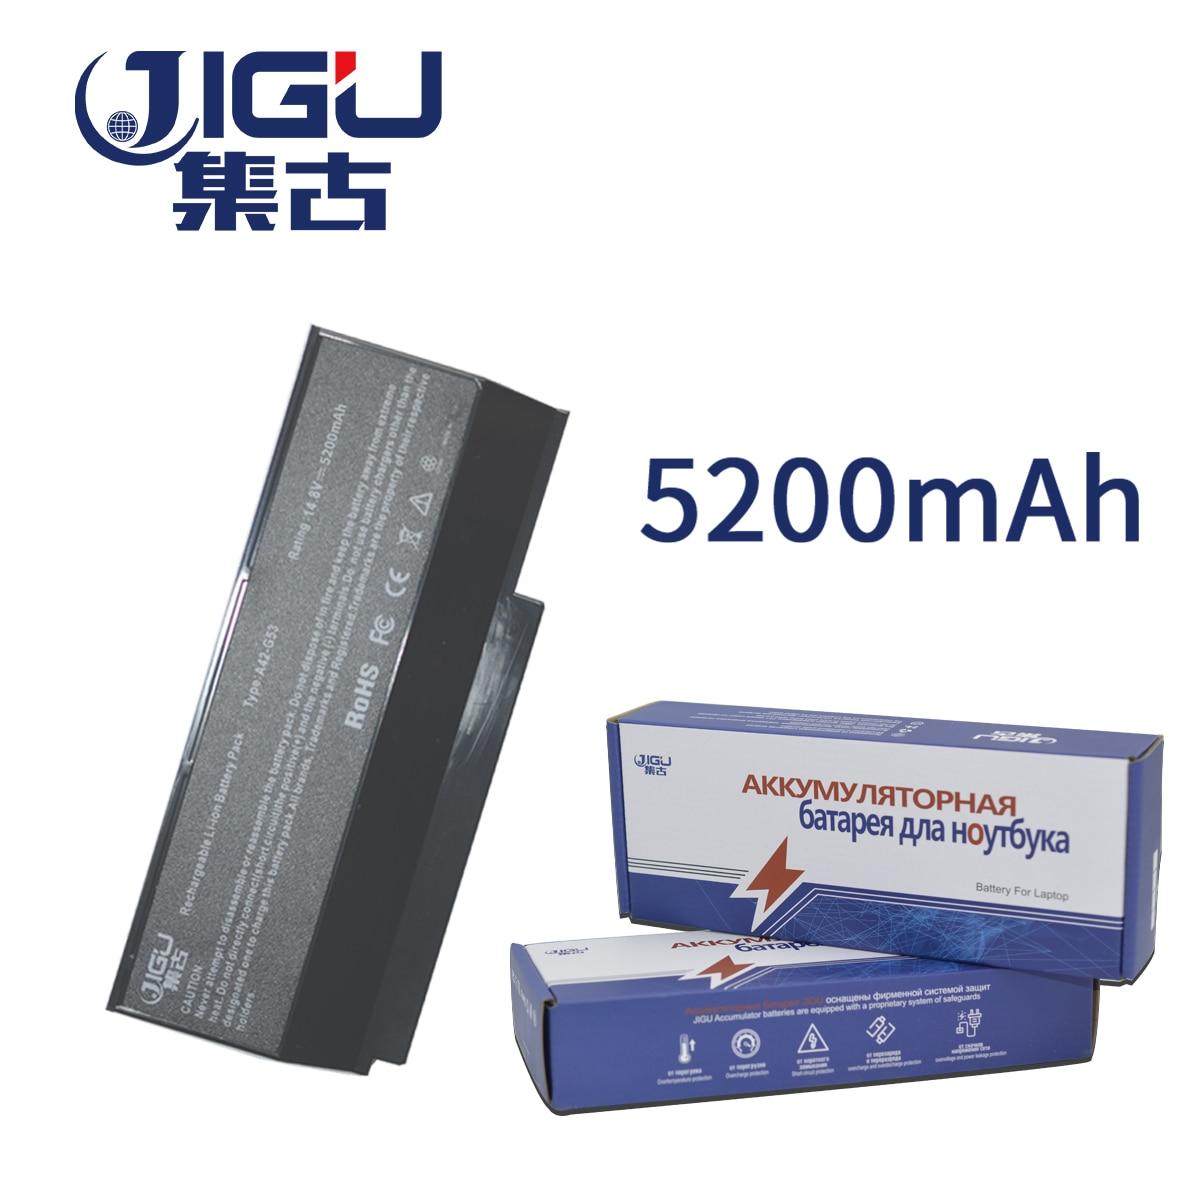 JIGU 07G016DH1875 70-NY81B1000Z 90-NY81B1000Y A42-G73 G73-52 batería para Asus G53 G53J G53JH G53JQ G53JW G53JX G53S G53SV